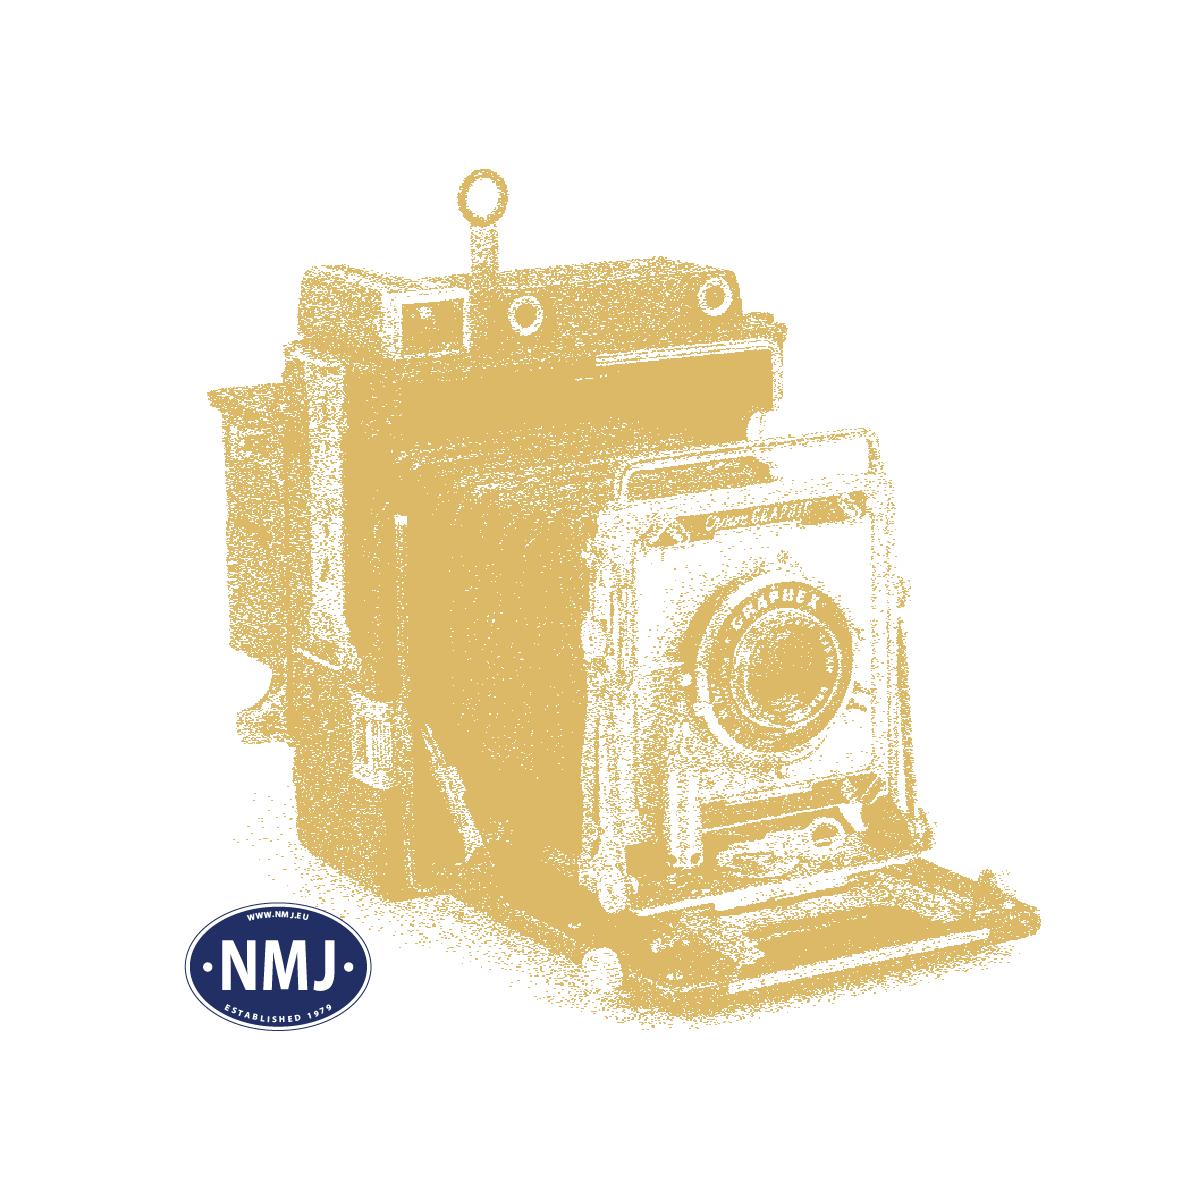 MWB-P403 - Gresstuster, Sen Sommer, 4,5 mm, 21 x 15 Cm